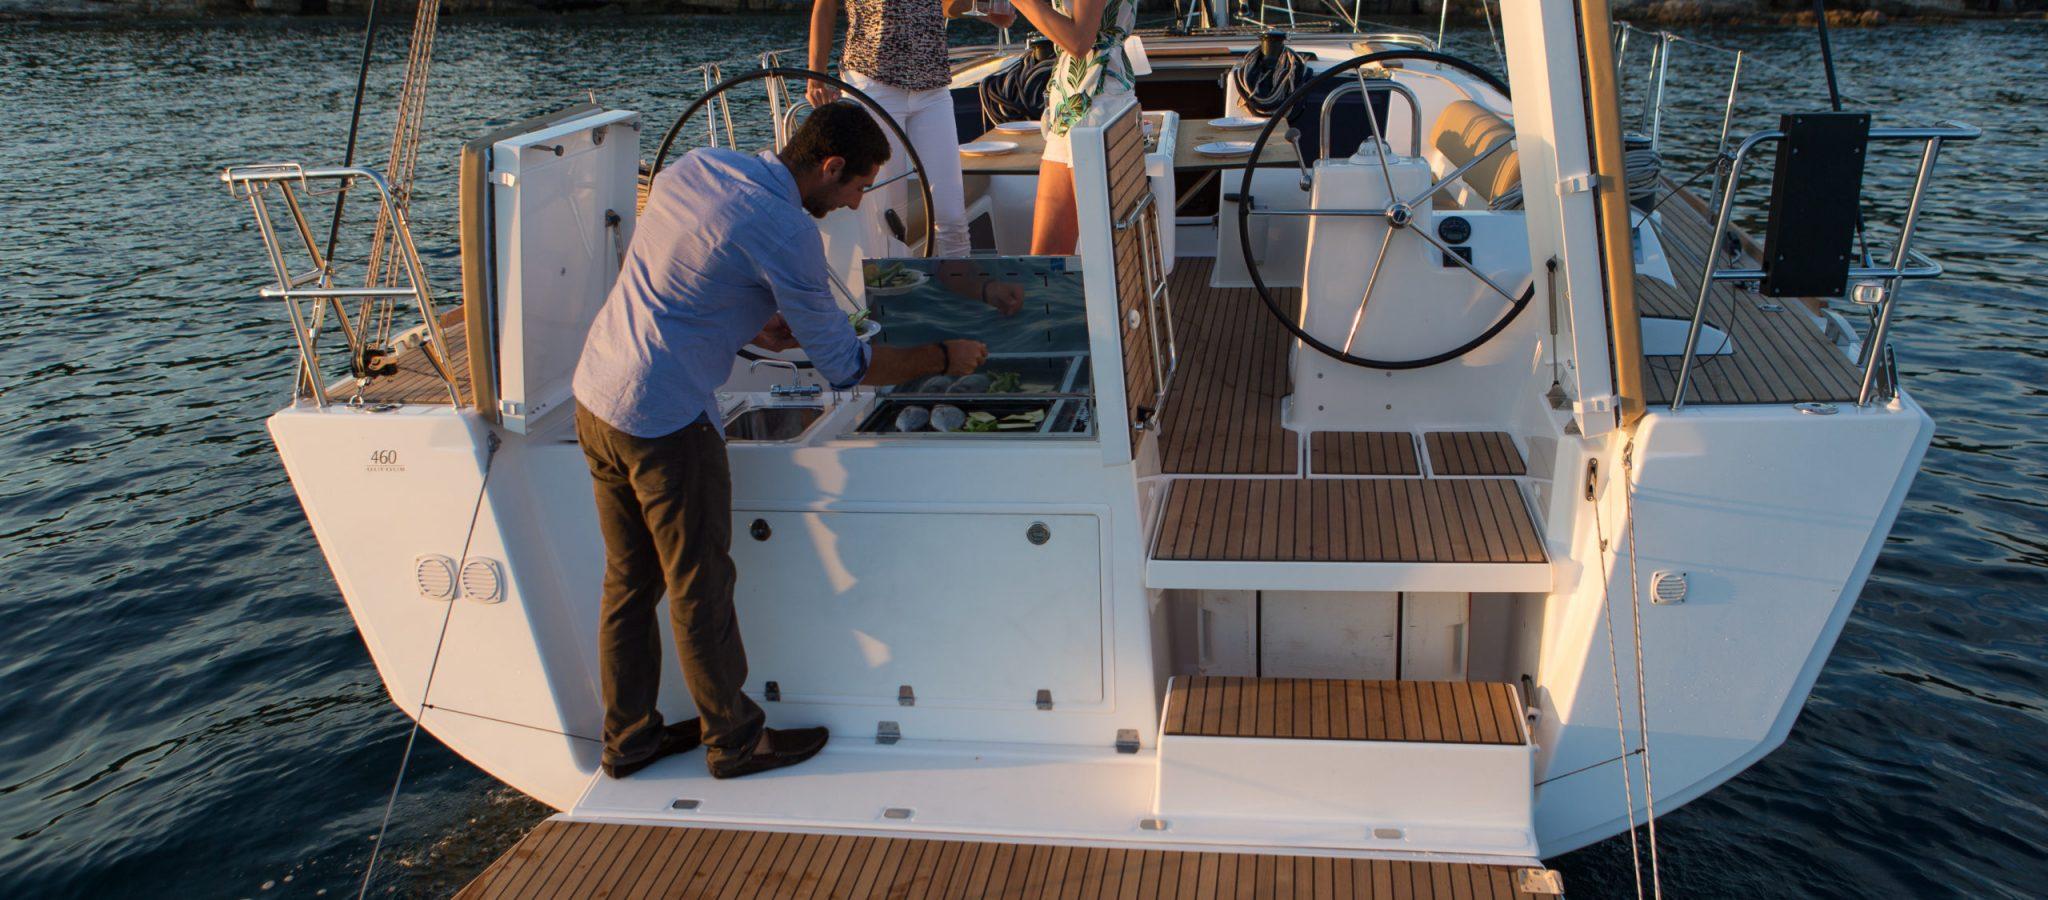 Cannes, 01/09/2015. Photoshoot new Dufour Yachts model, Dufour 460, Photo © Jean Marie Liot / Dufour Yachts